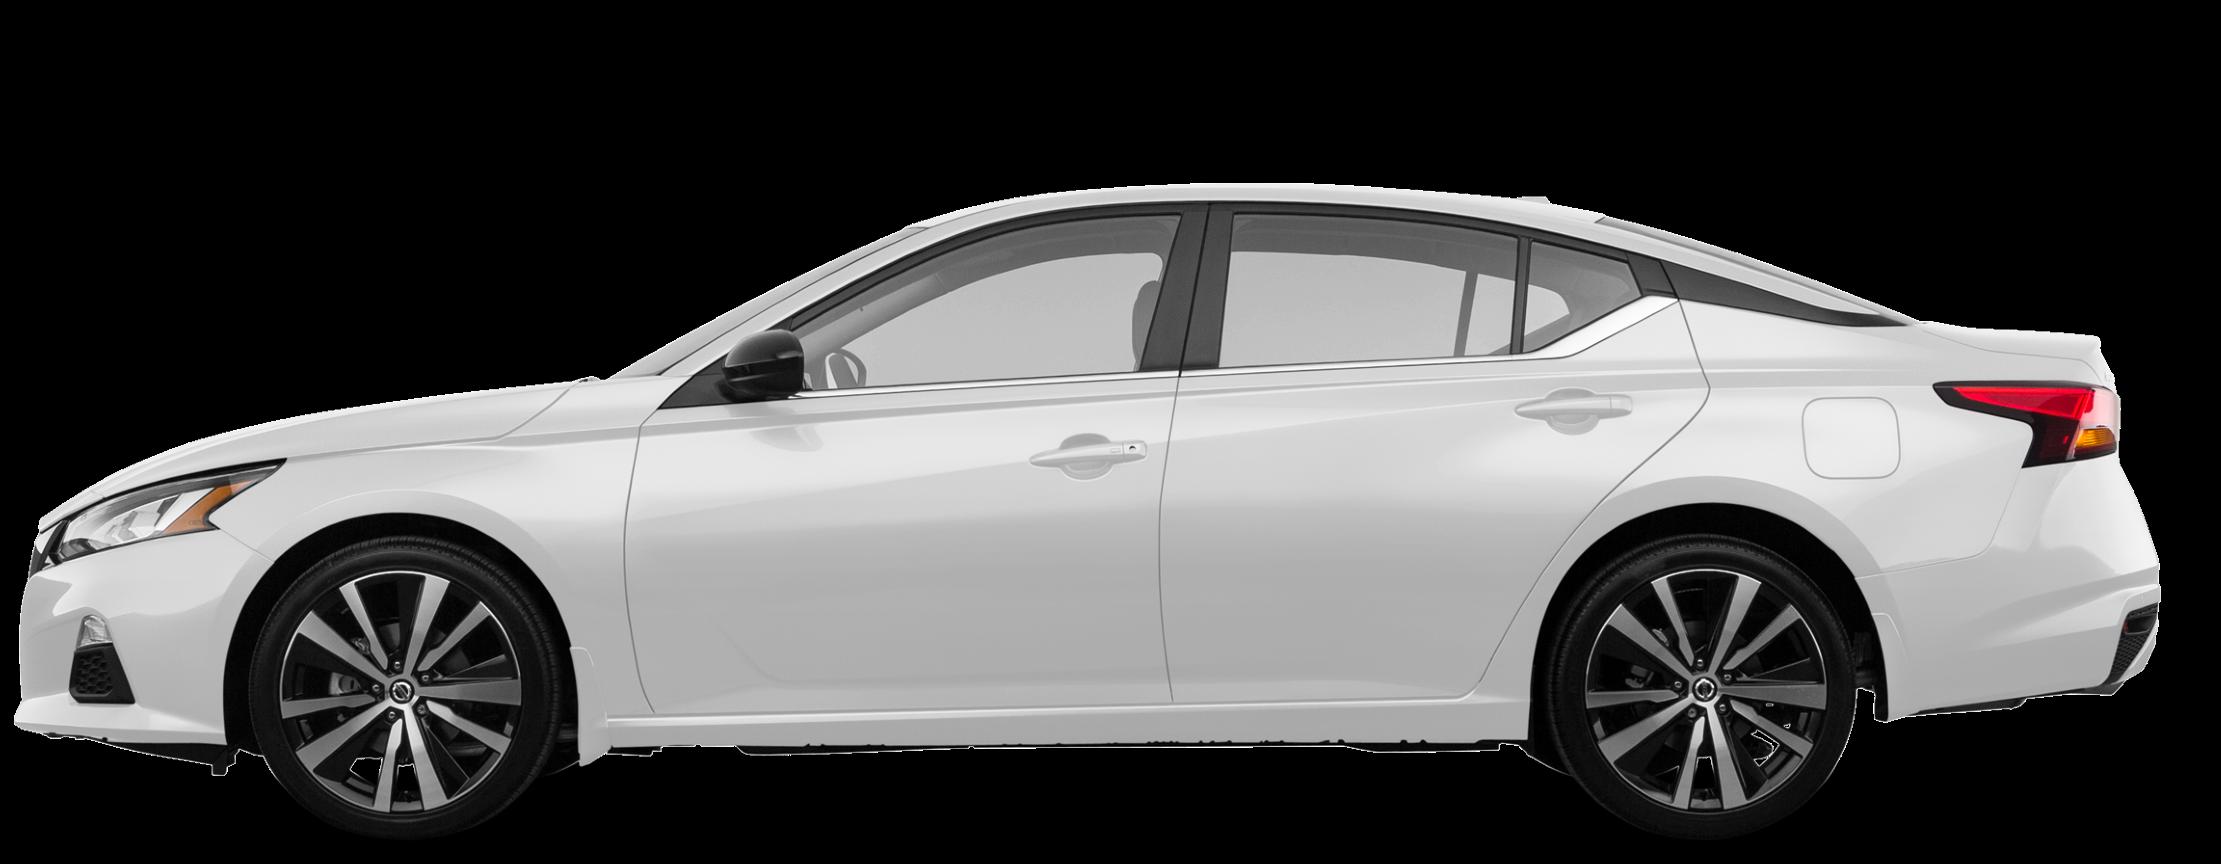 Sedan & Coupe